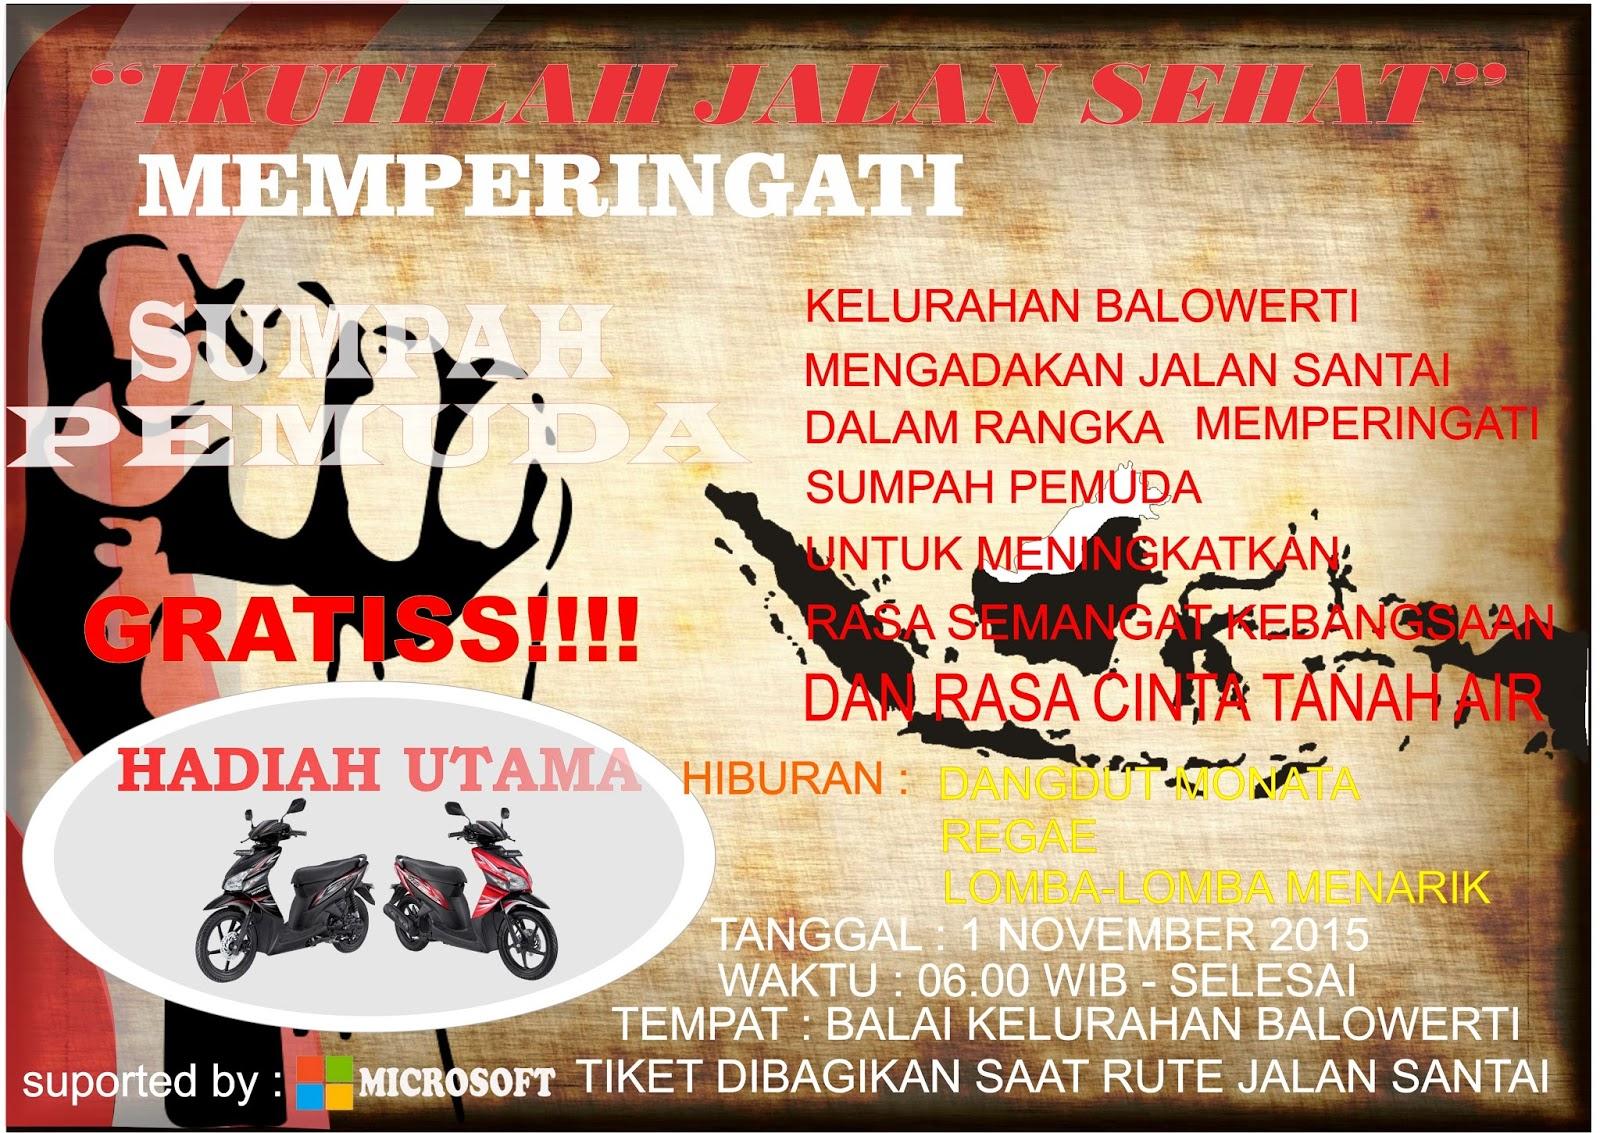 Seribu Film Contoh Poster Jalan Santai